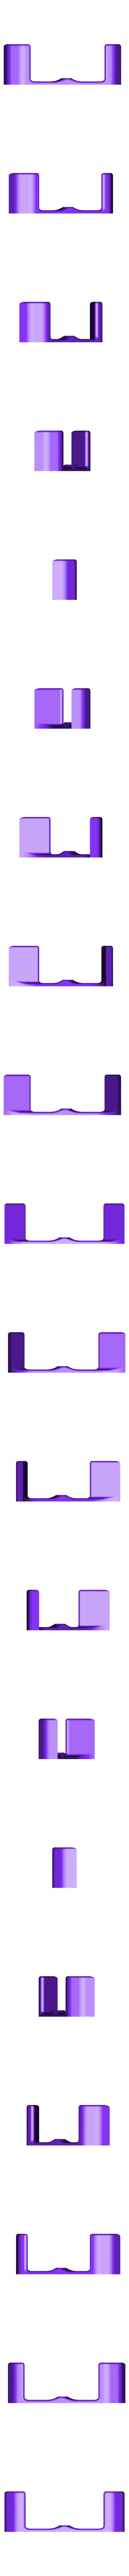 QuadHook.stl Download free STL file Generic Quadcopter Wall Hook • 3D printer design, roguemat